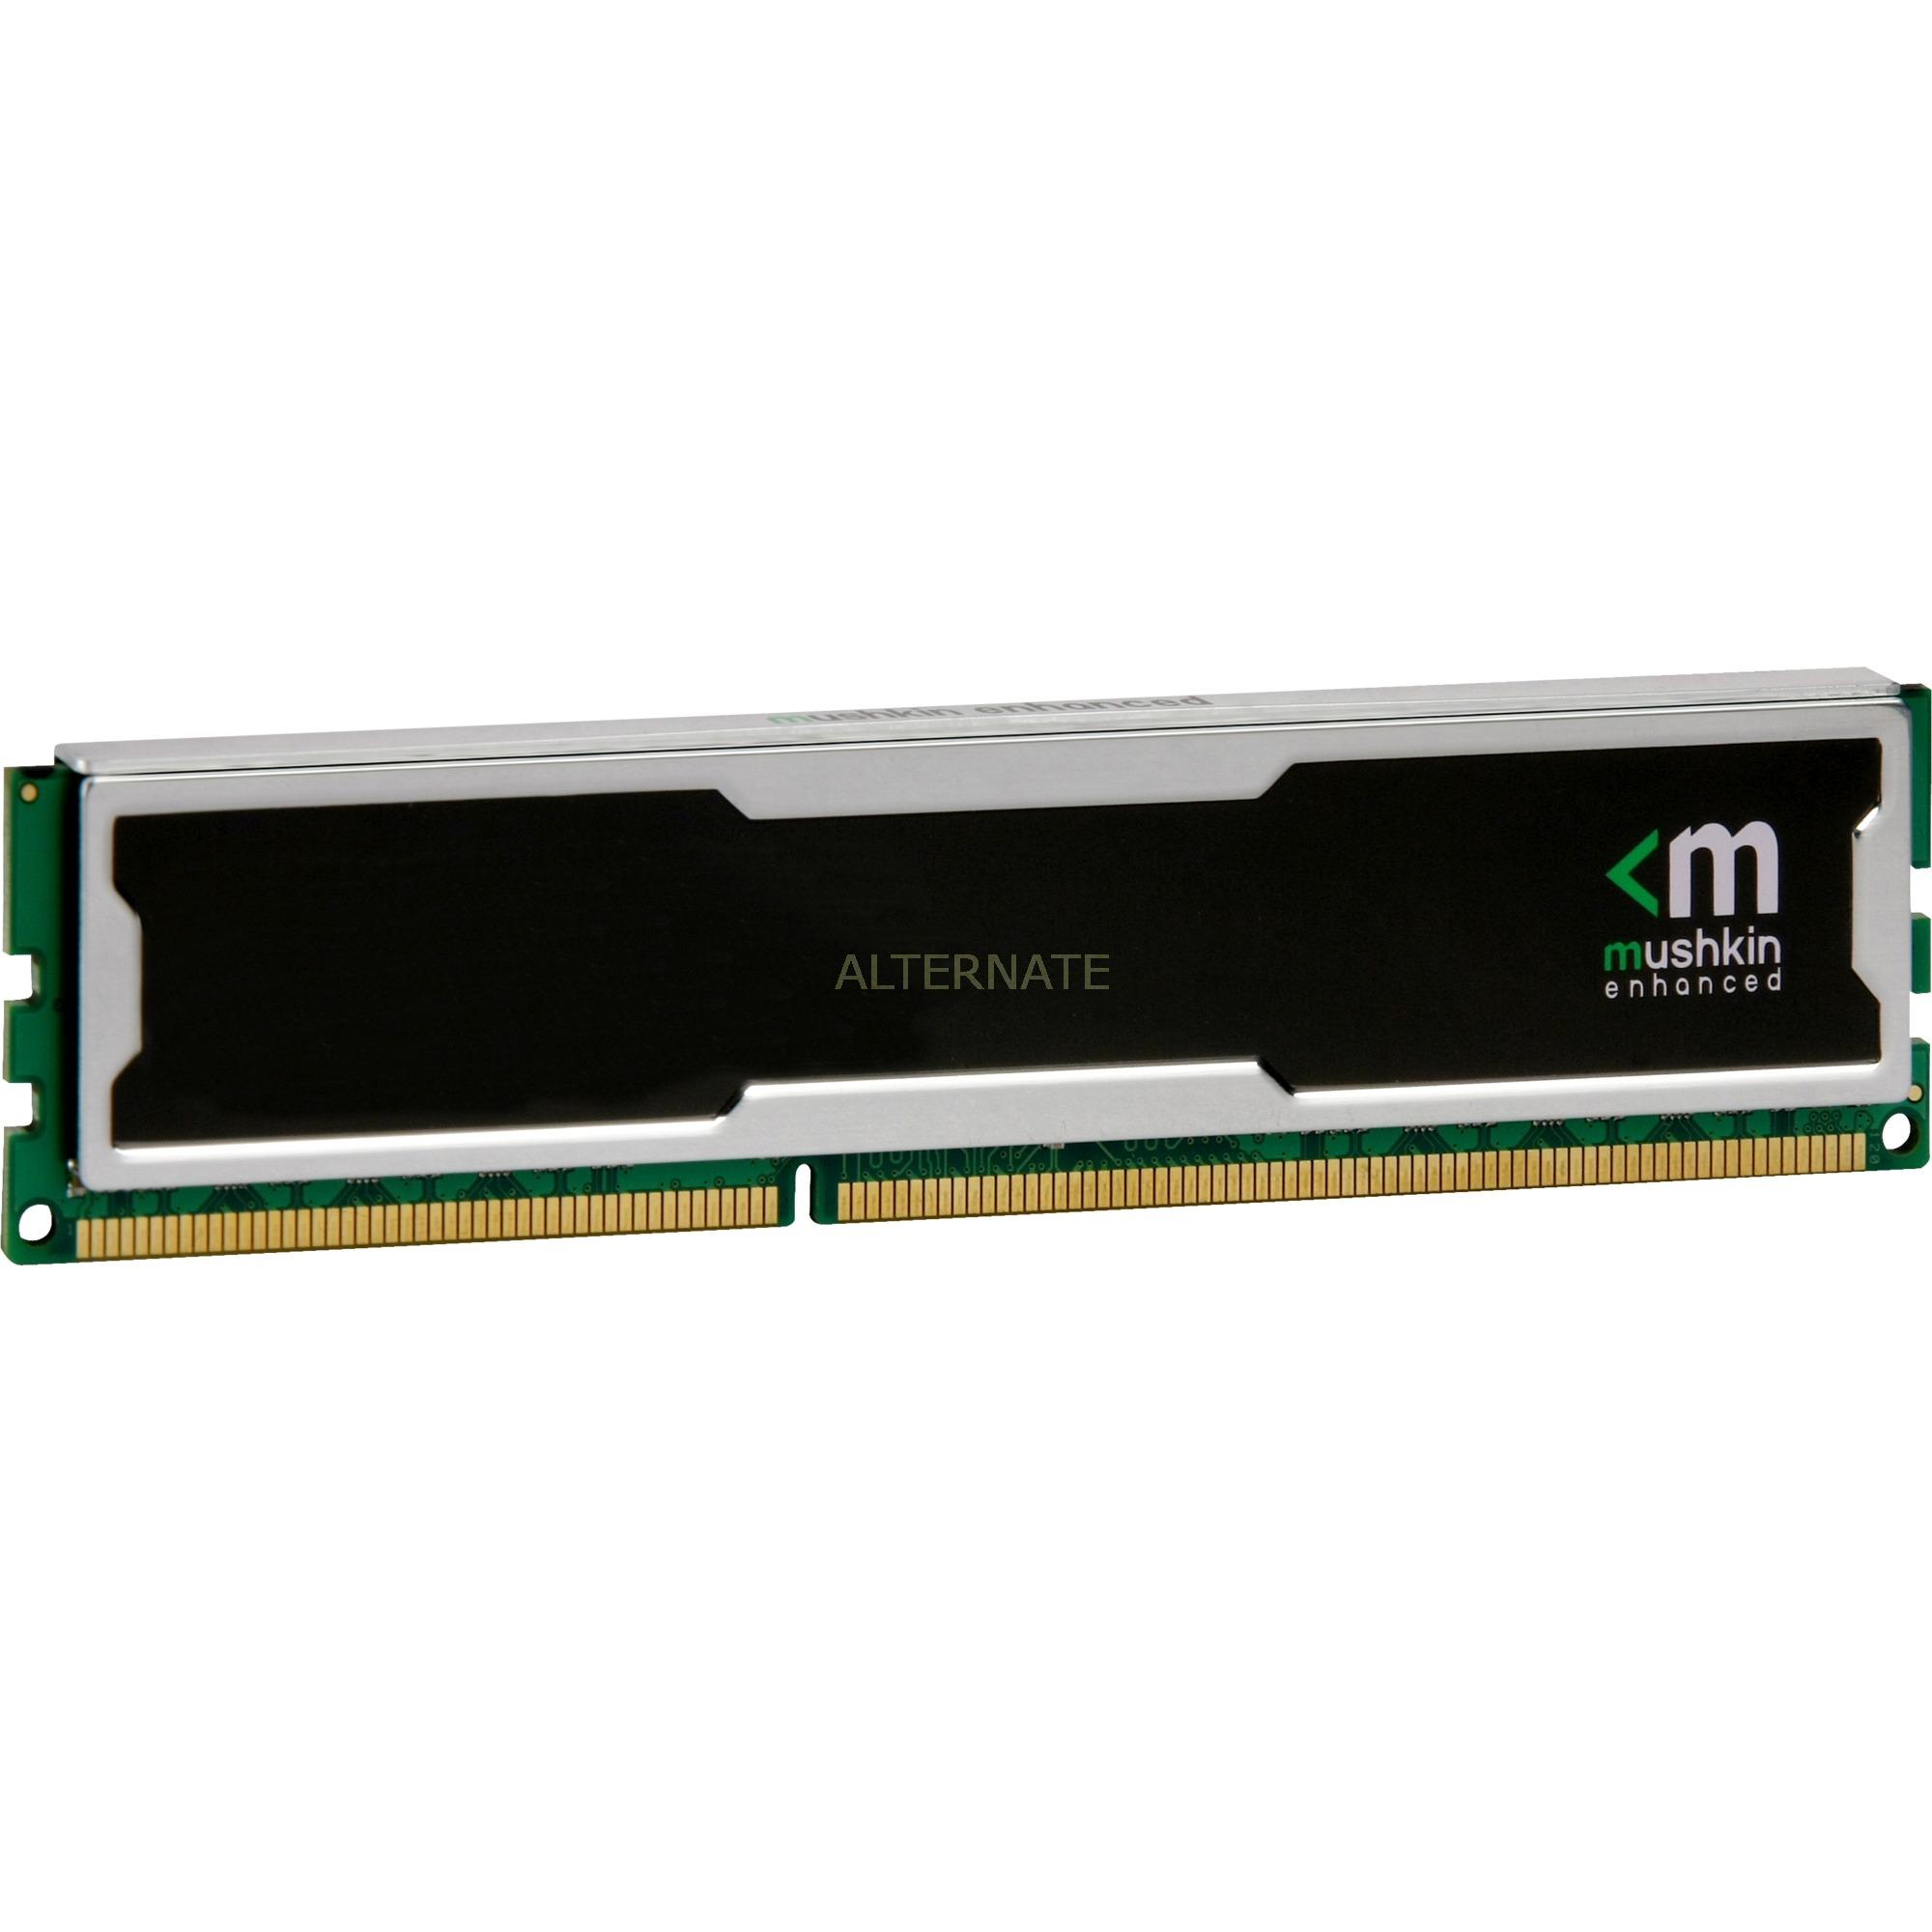 1GB PC3200 módulo de memoria DDR 400 MHz, Memoria RAM